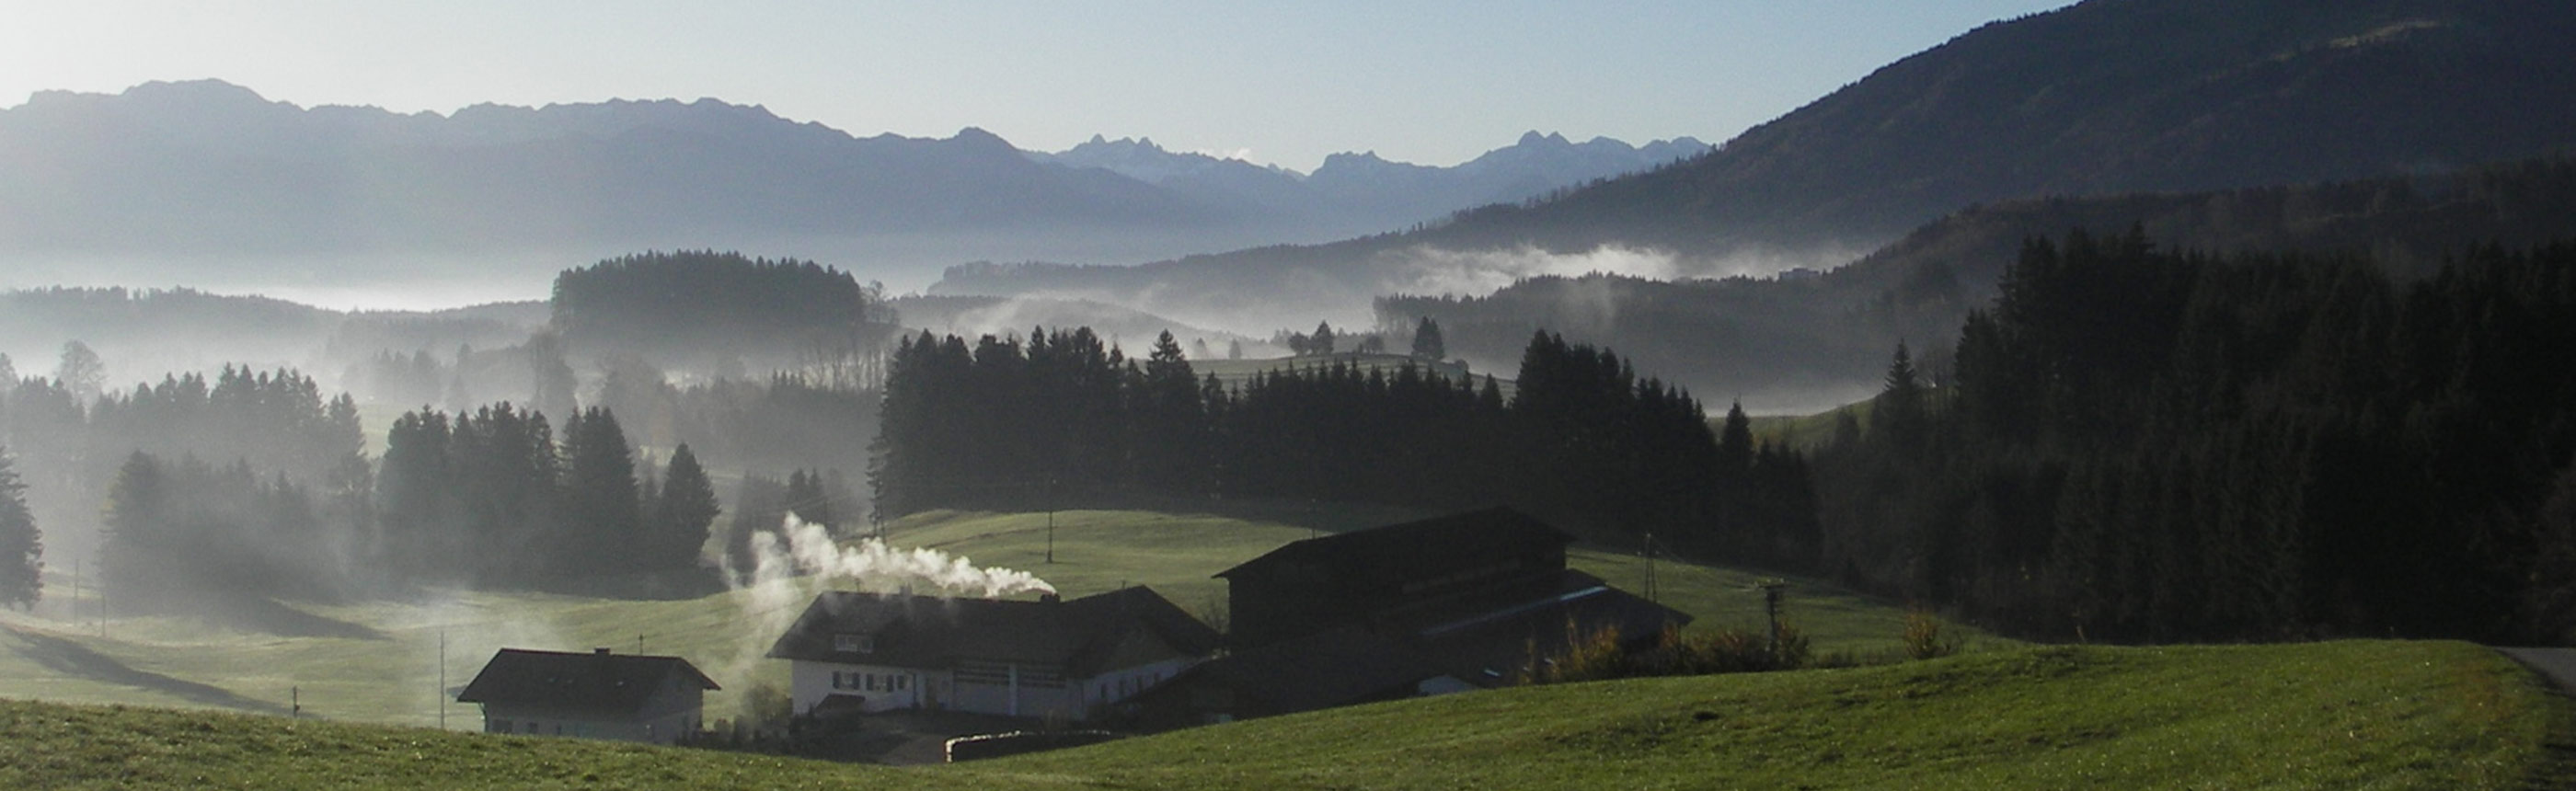 Ortsvereinigung der FBG Oberallgäu e.V.